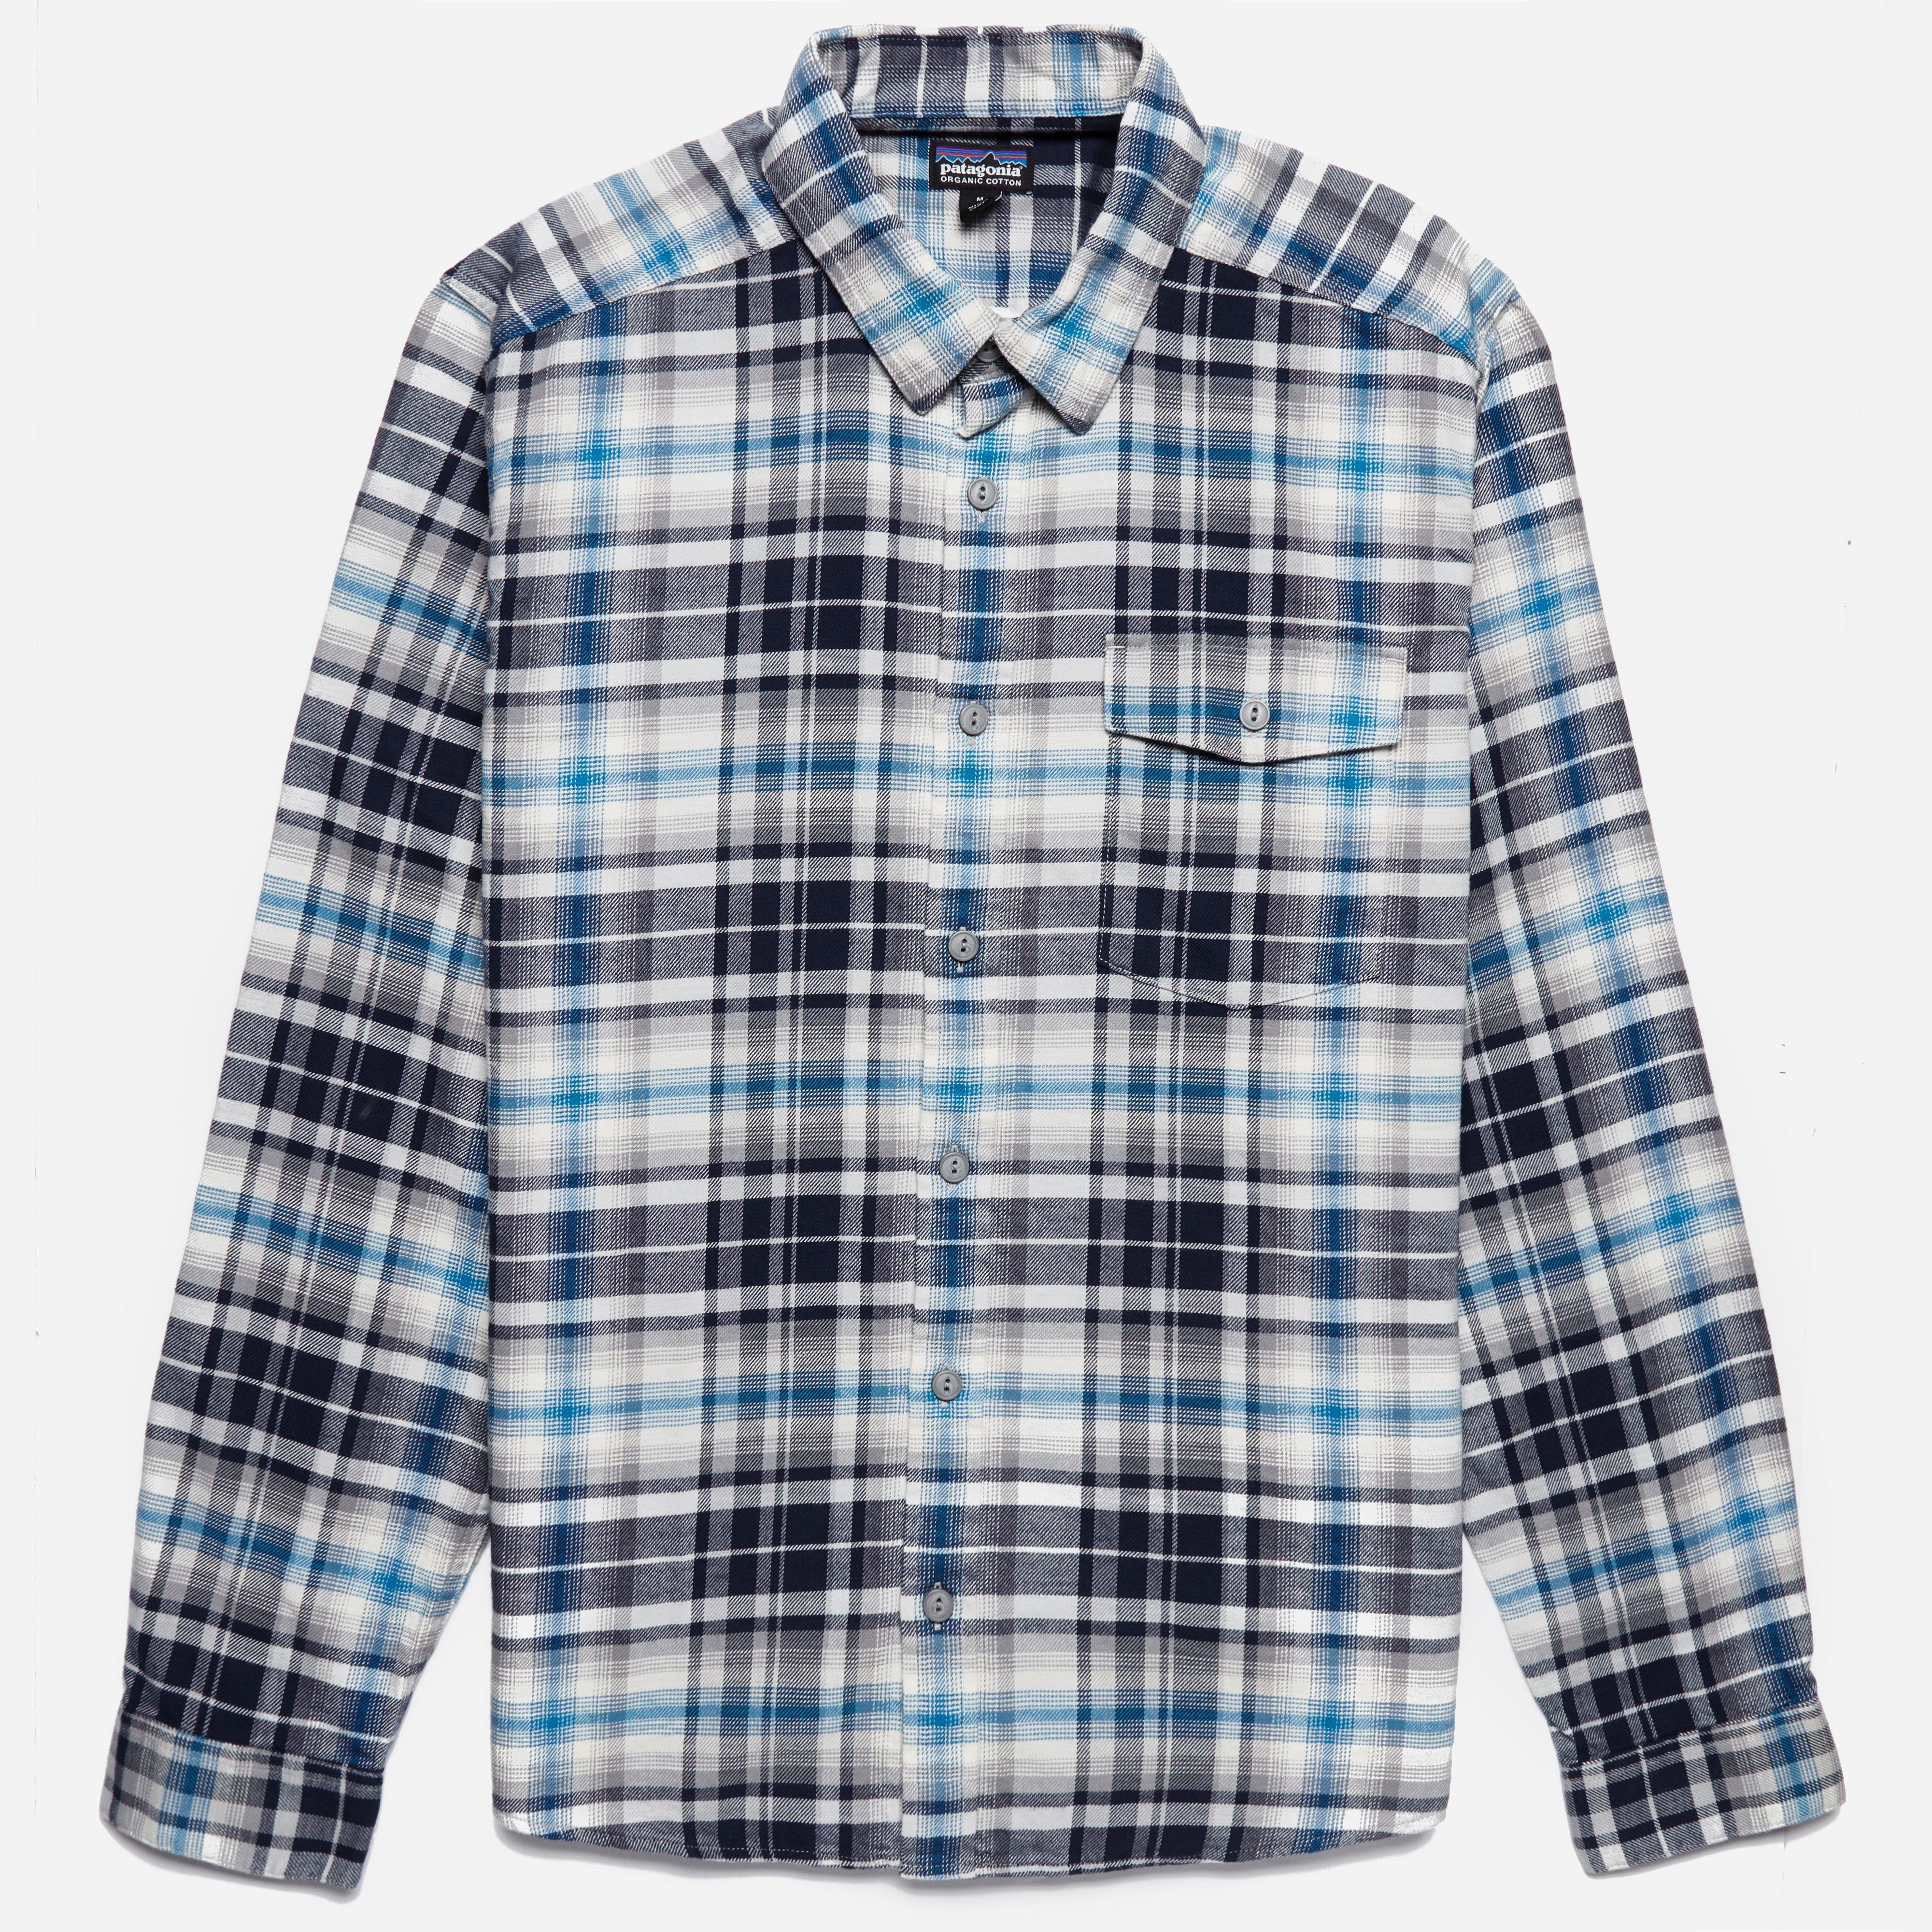 Patagonia LW Fjord Flannel Shirt